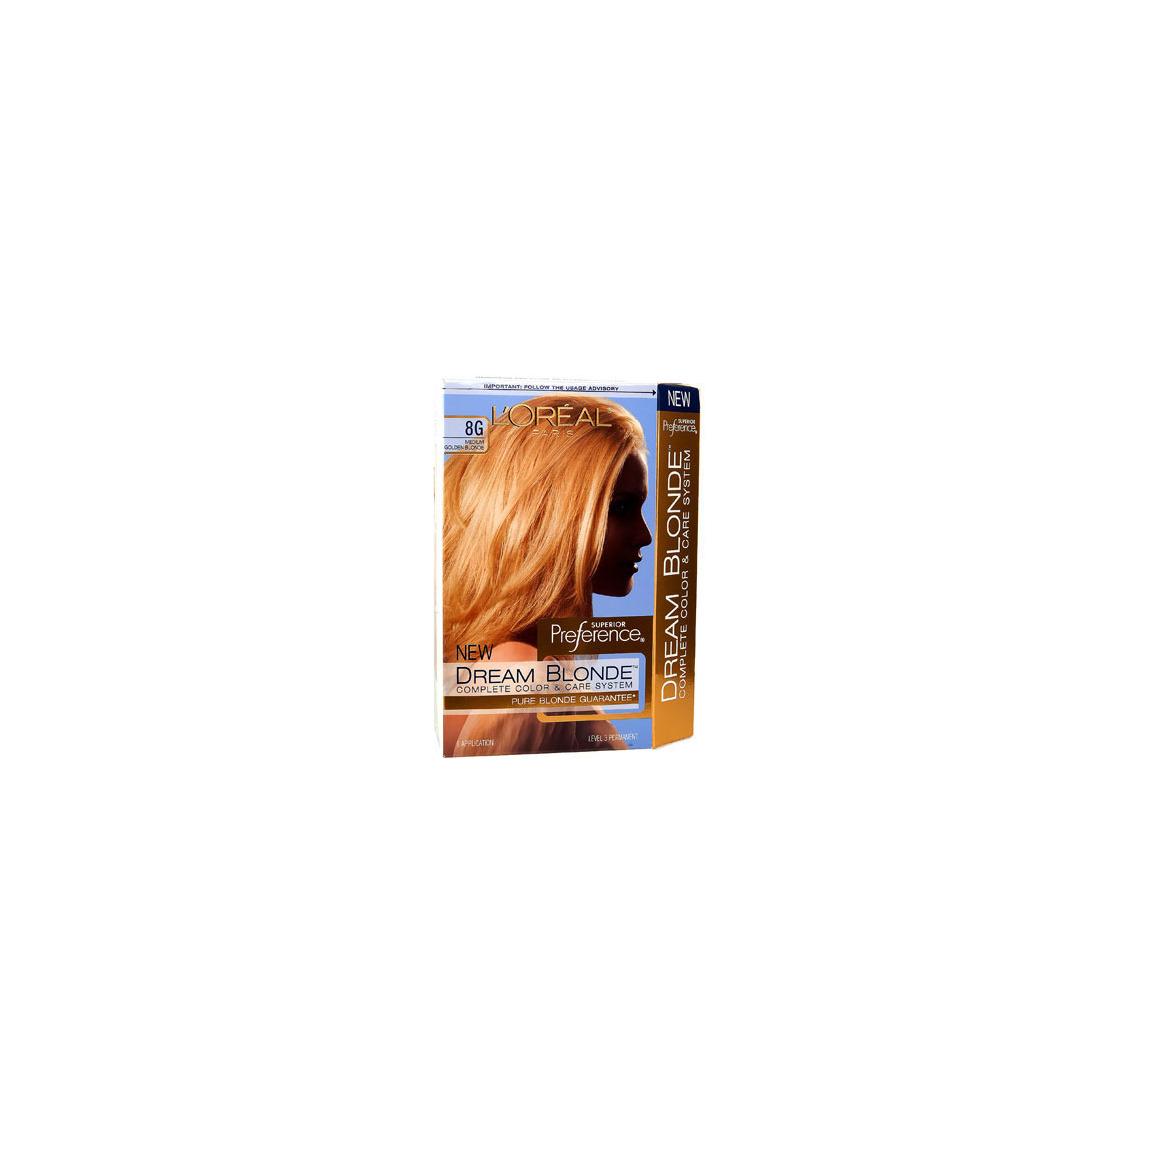 Loral Dream Blonde Hair Color Medium Golden Blonde 8g Beautylish